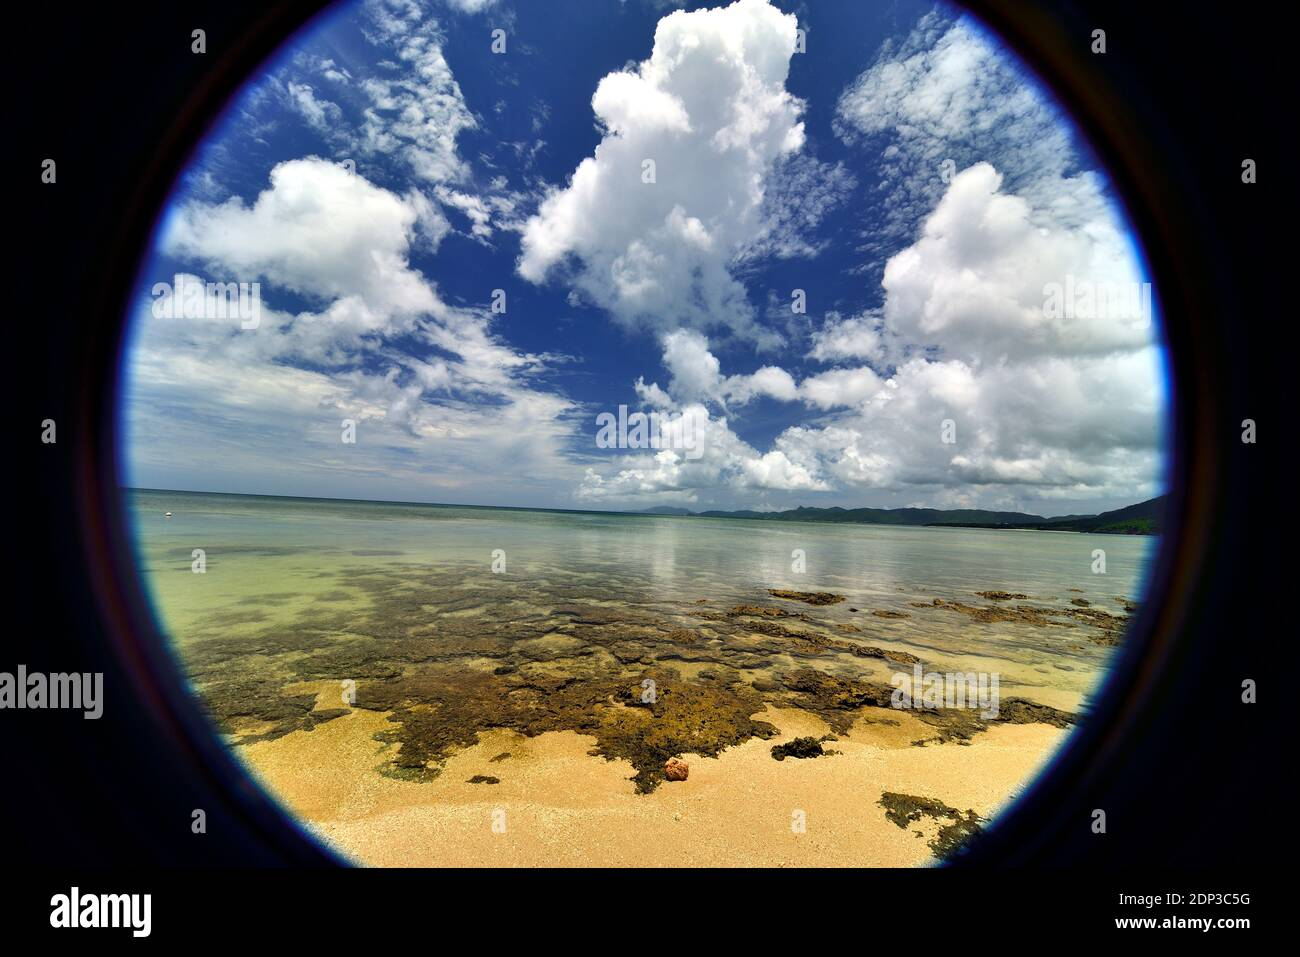 Yonehara Beach, Low Tide,  Empty, Fishe Eye View, Ishigaki, Yahema Islands, Ryukyu Islands, Okinawa, Japan Stock Photo